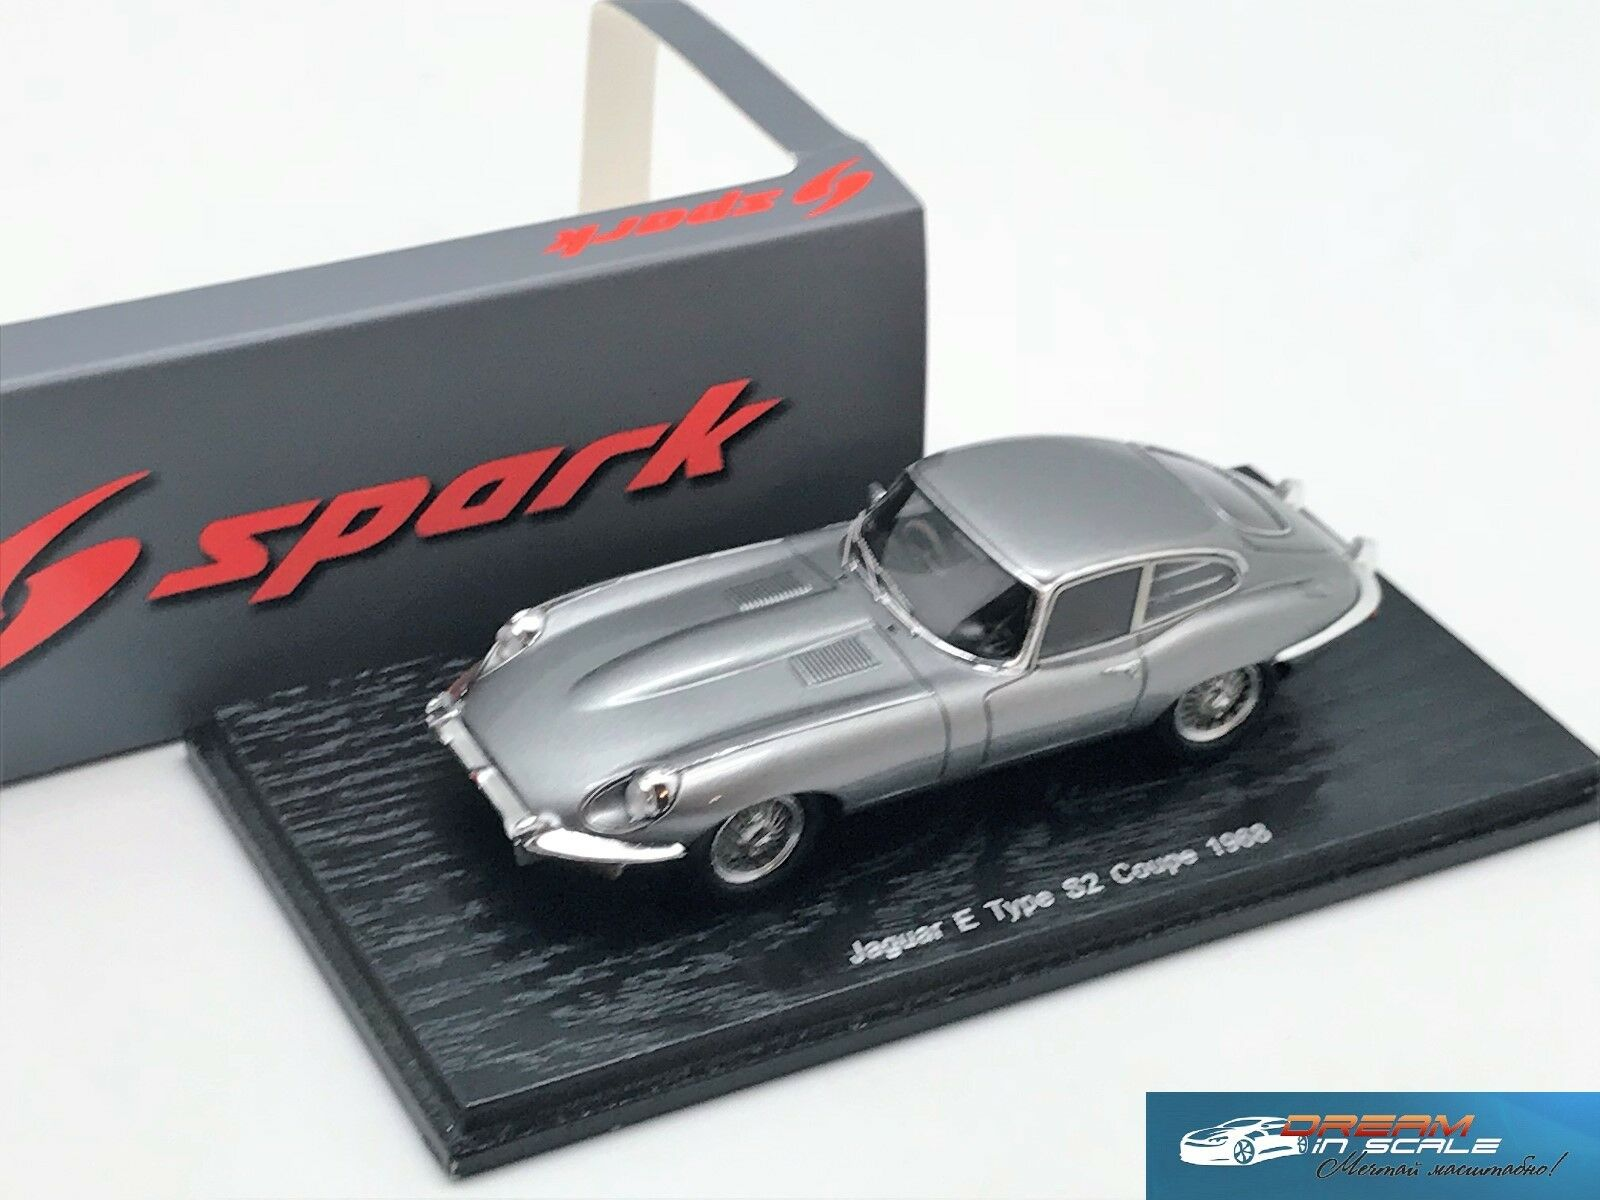 ventas en linea Jaguar E Tipo S2 Coupe 1968 1968 1968 Spark S2128 Resina 1 43  Ahorre 35% - 70% de descuento